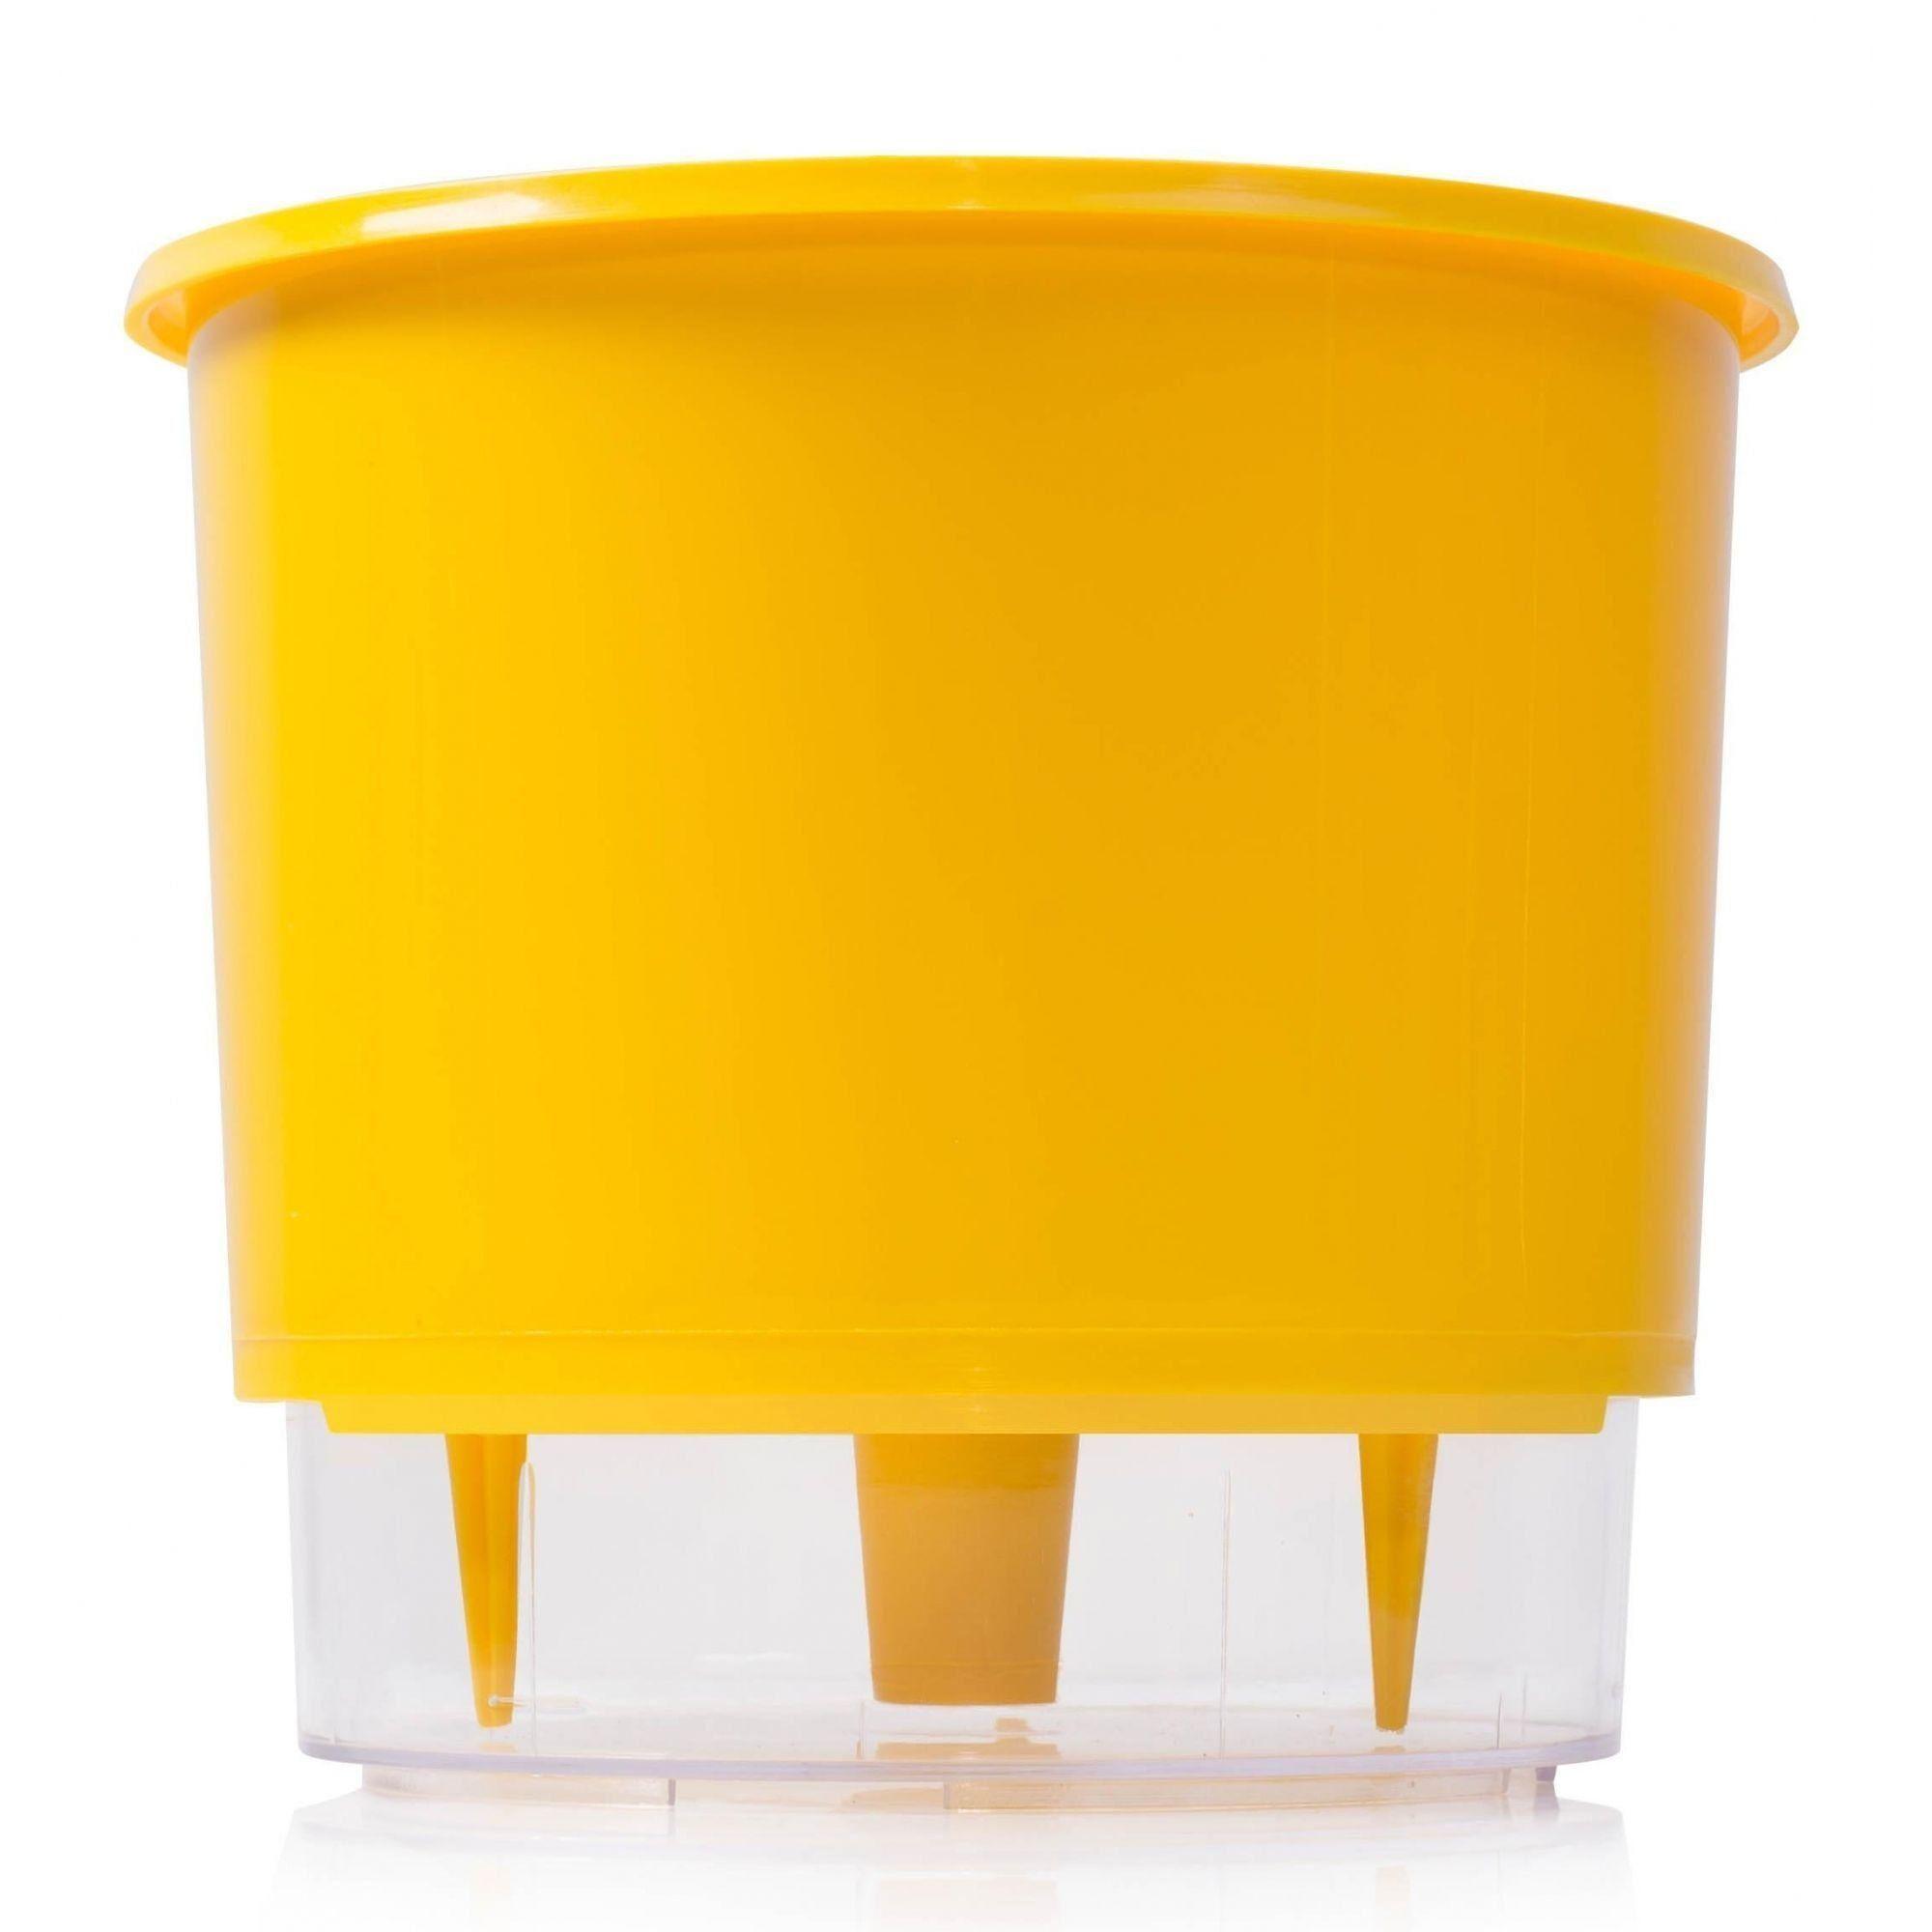 Vaso auto irrigável Raiz MÉDIO N03 16 cm X 14 cm Amarelo